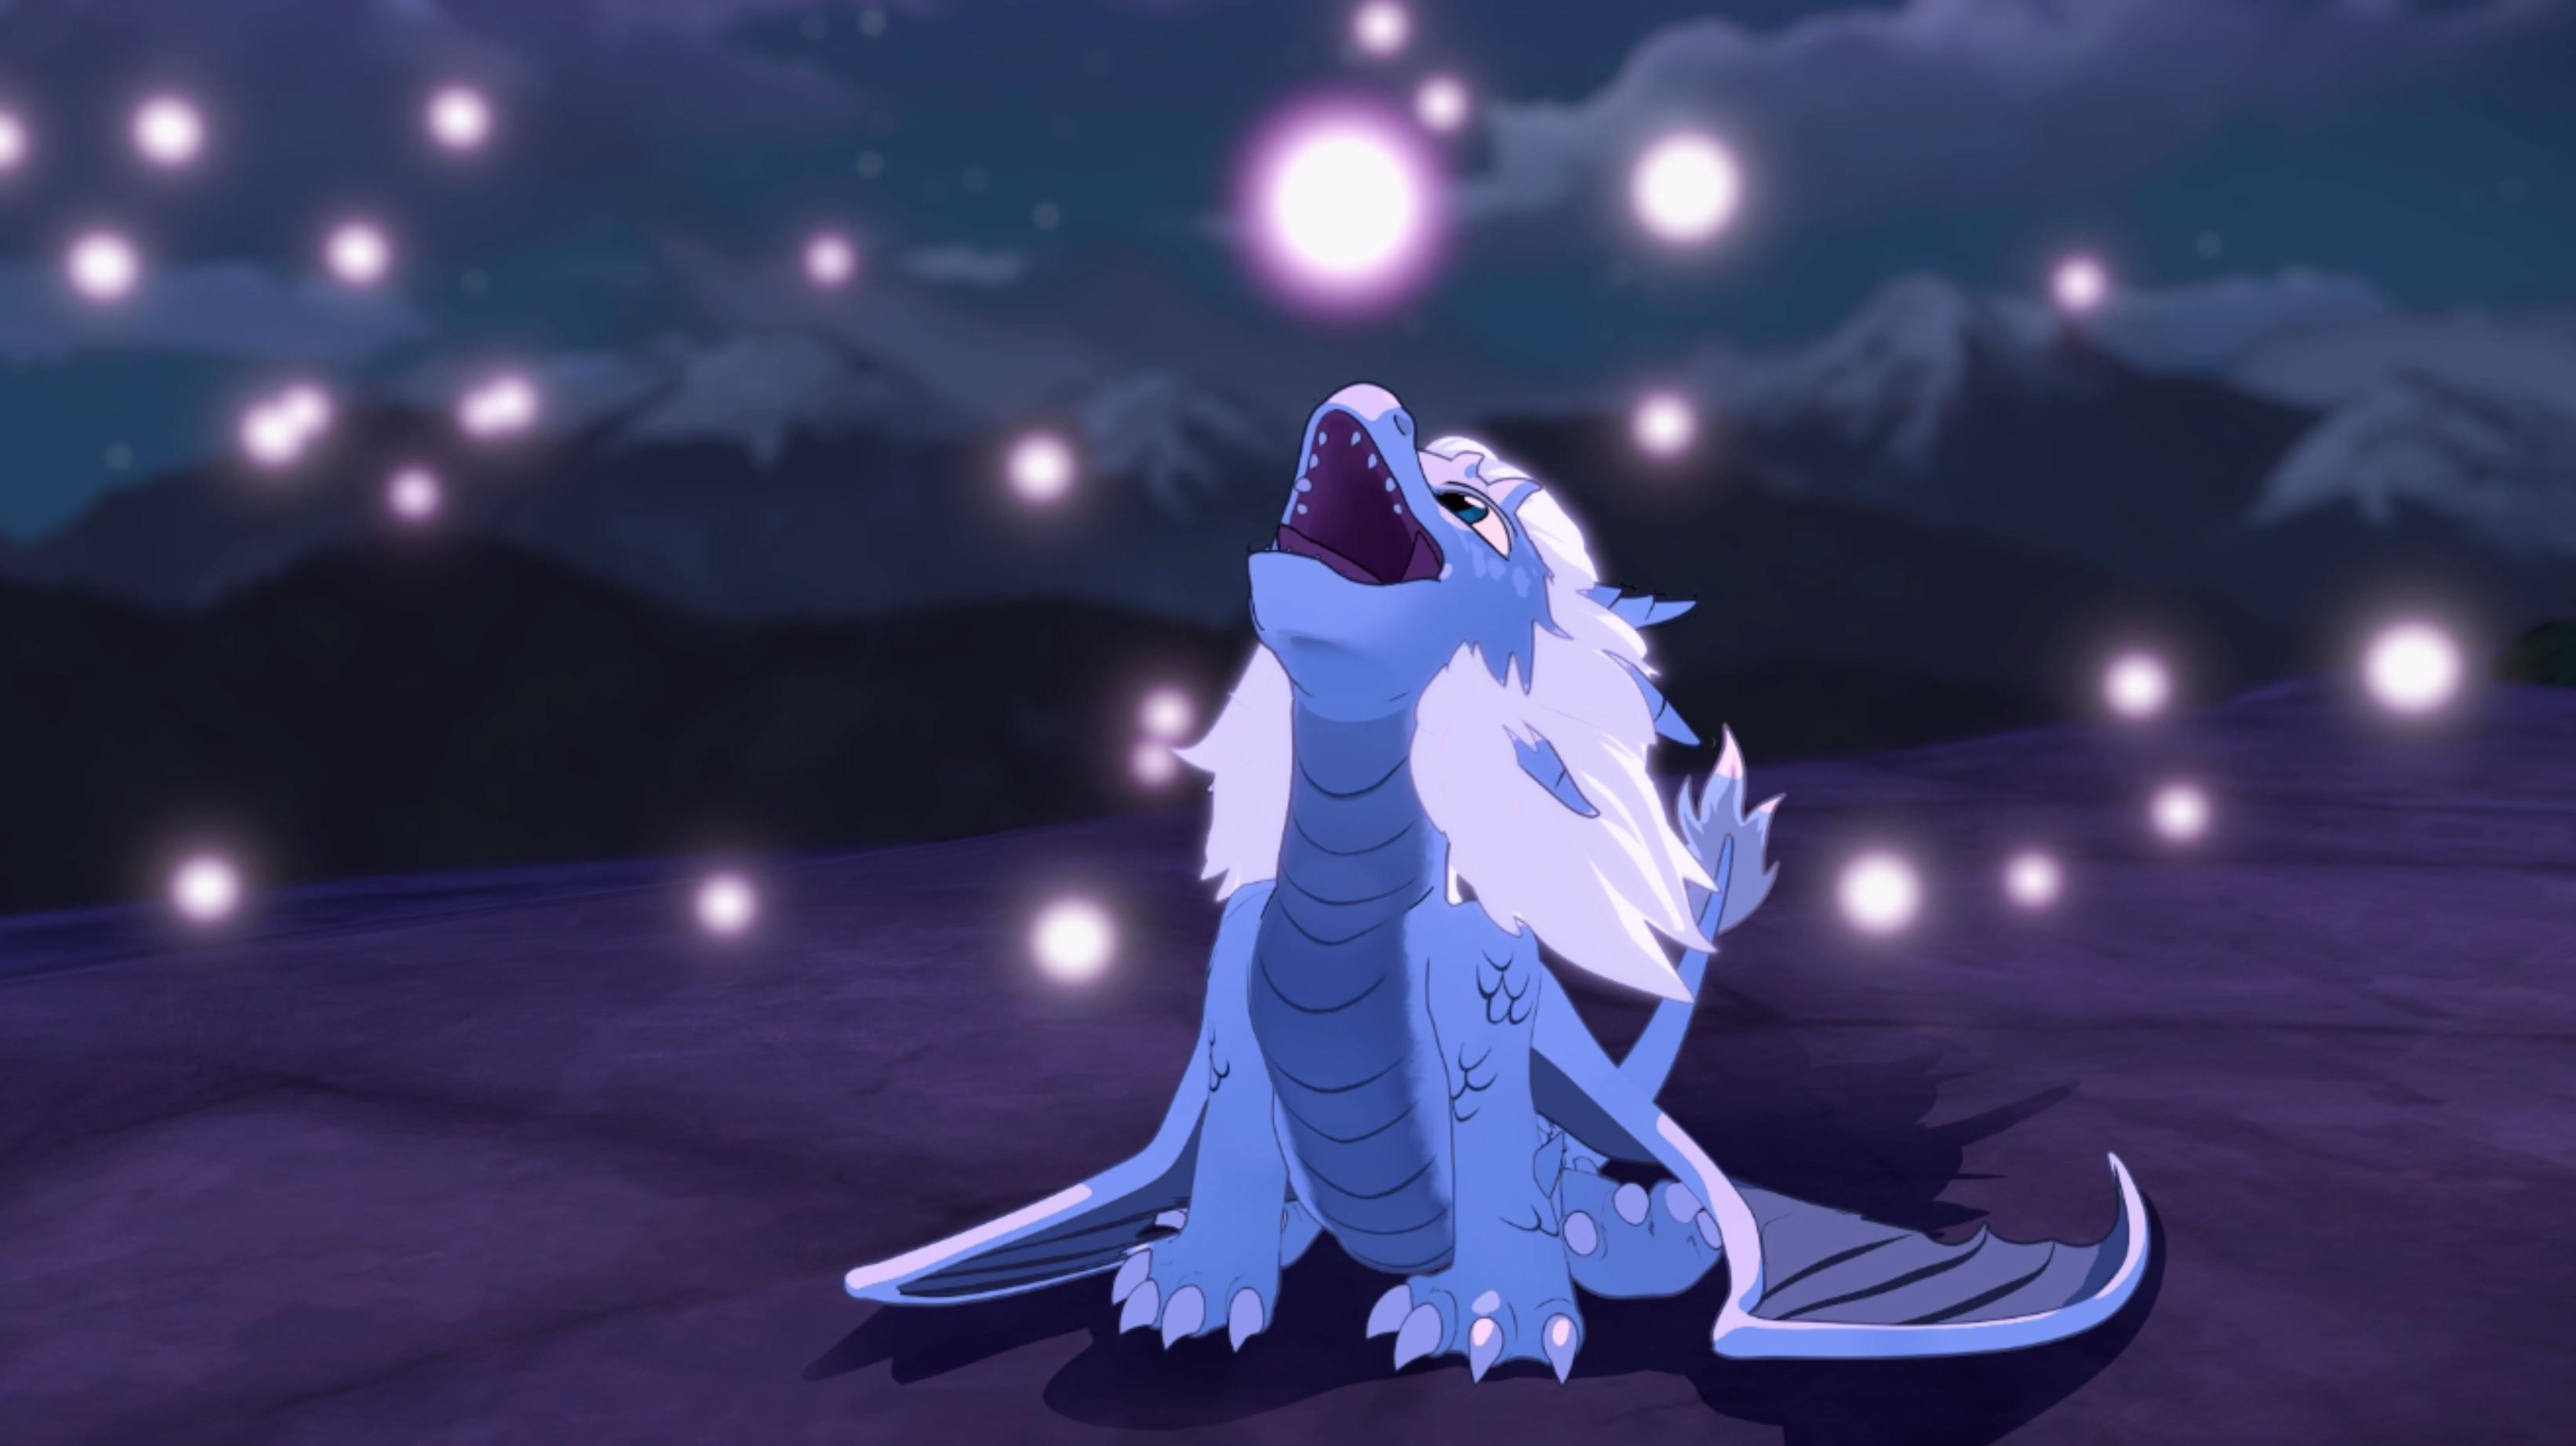 Dragon Prince: All Magic Incantations From The Dragon Prince Season One